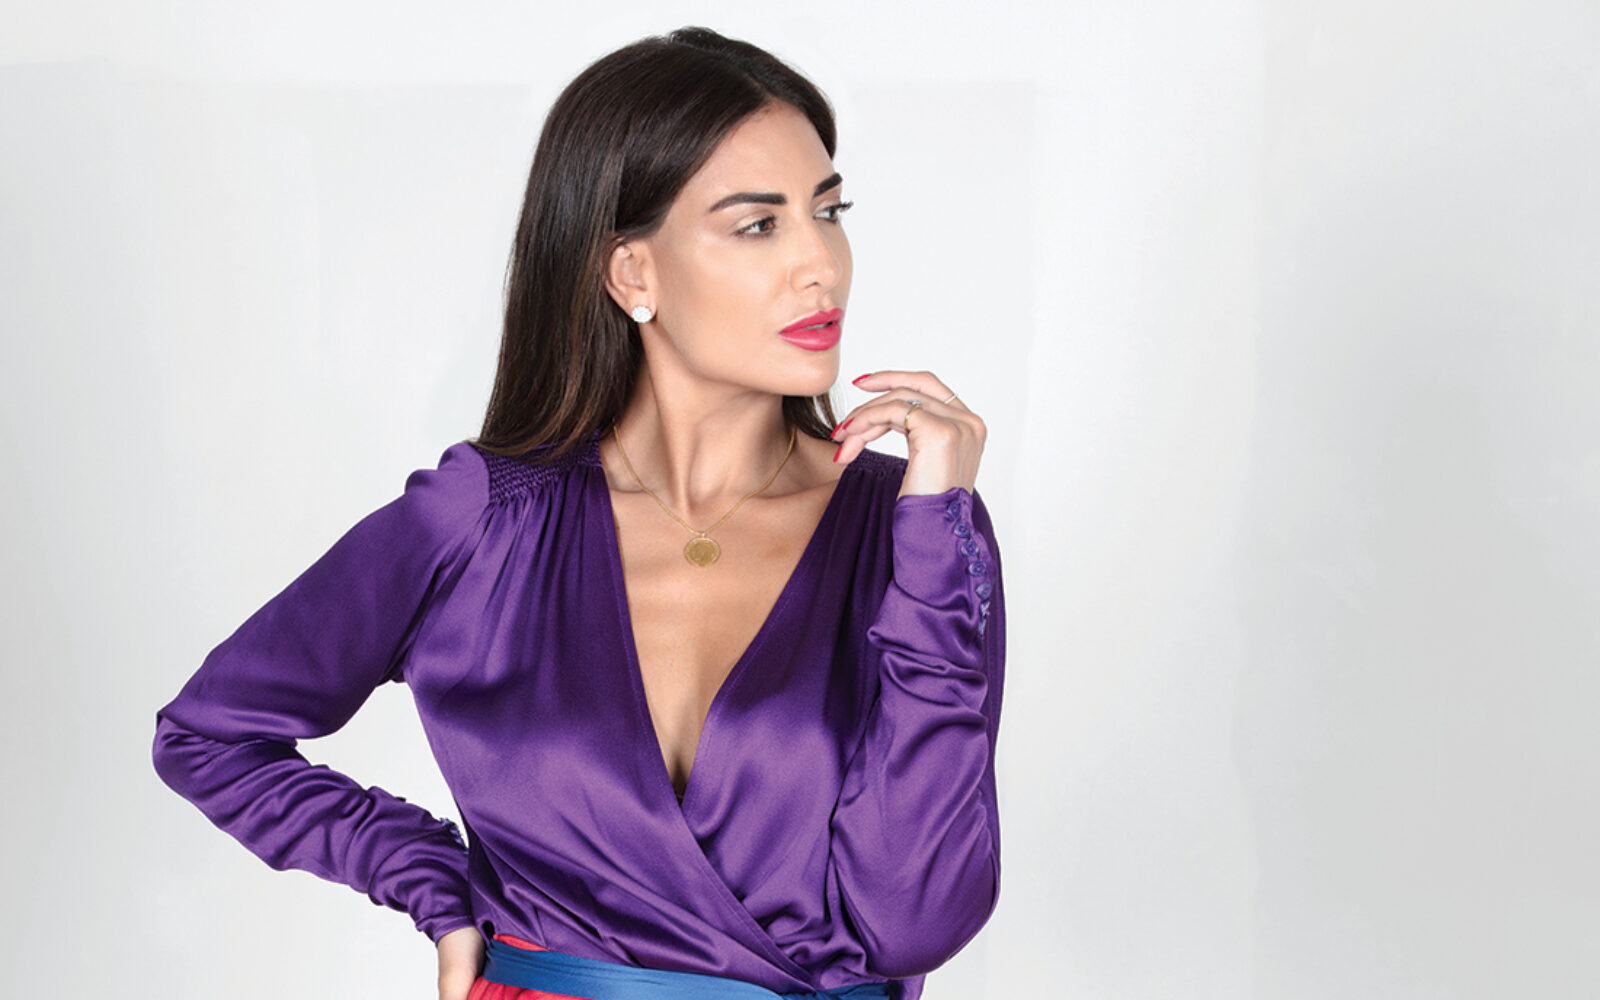 Soraya Shawky wears dress by Attico at Ounass